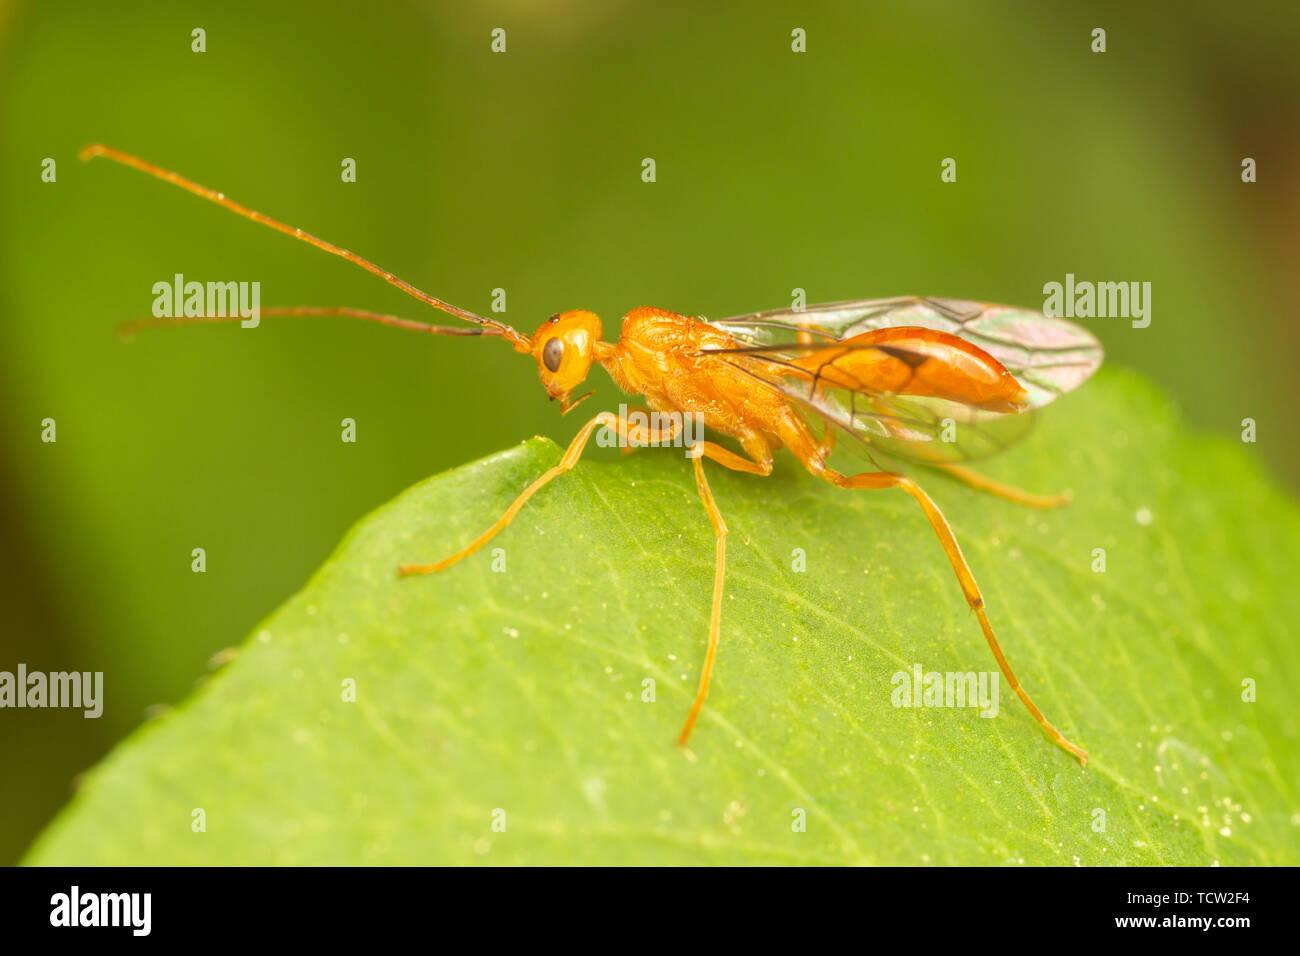 A male Aulacid Wasp (Aulacus burquei) - Stock Image